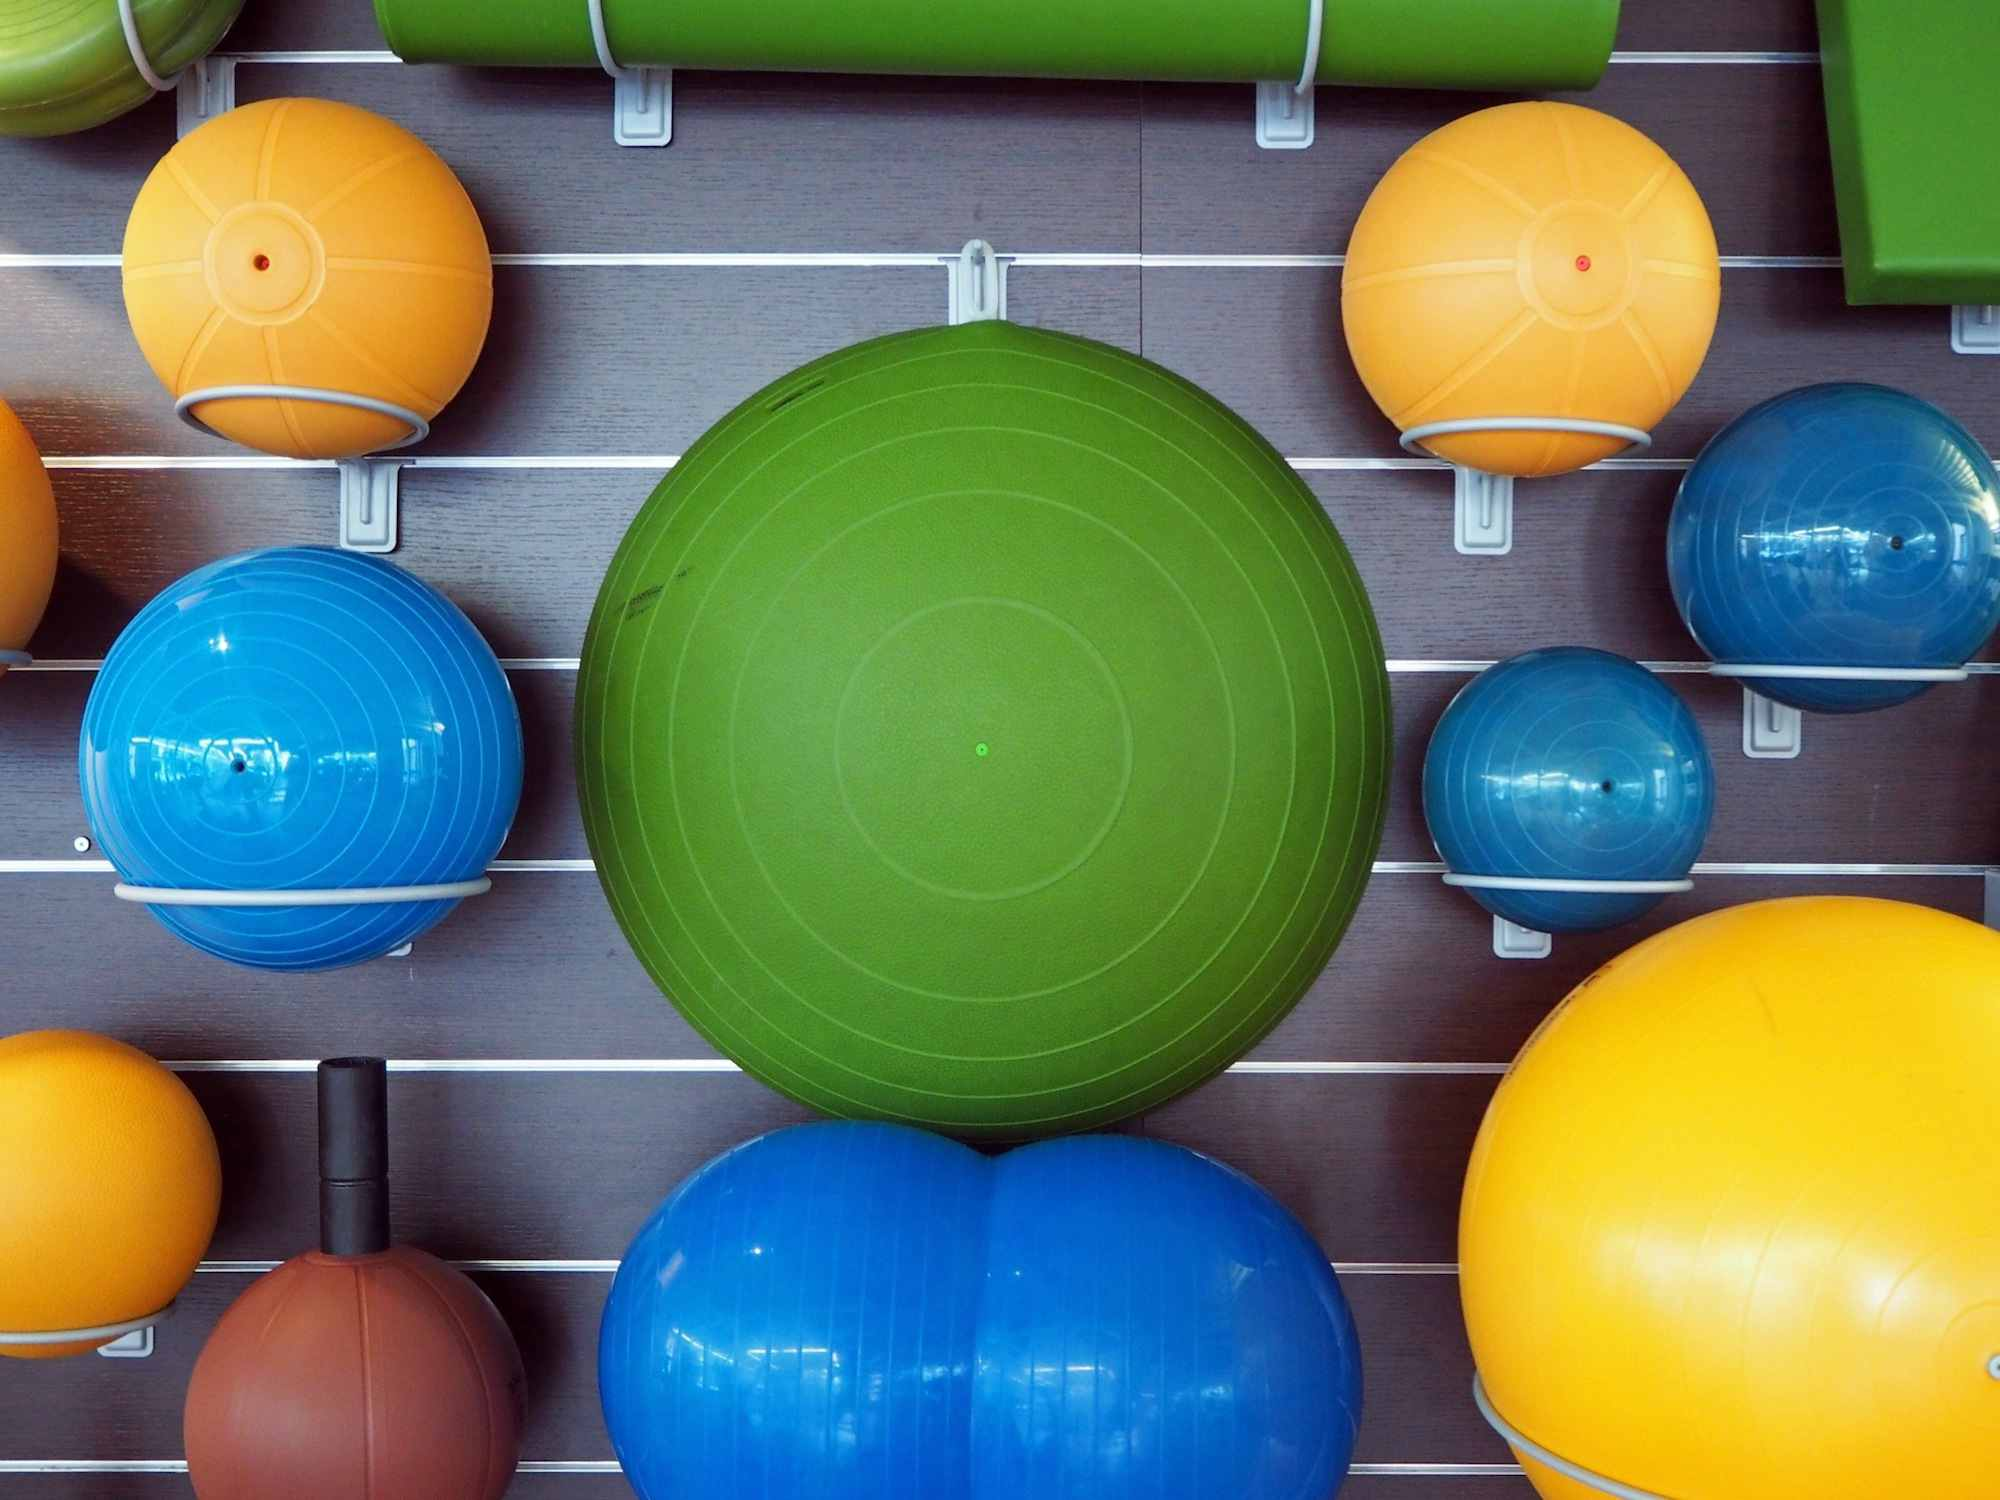 Fitness Balls Arranged In Gym